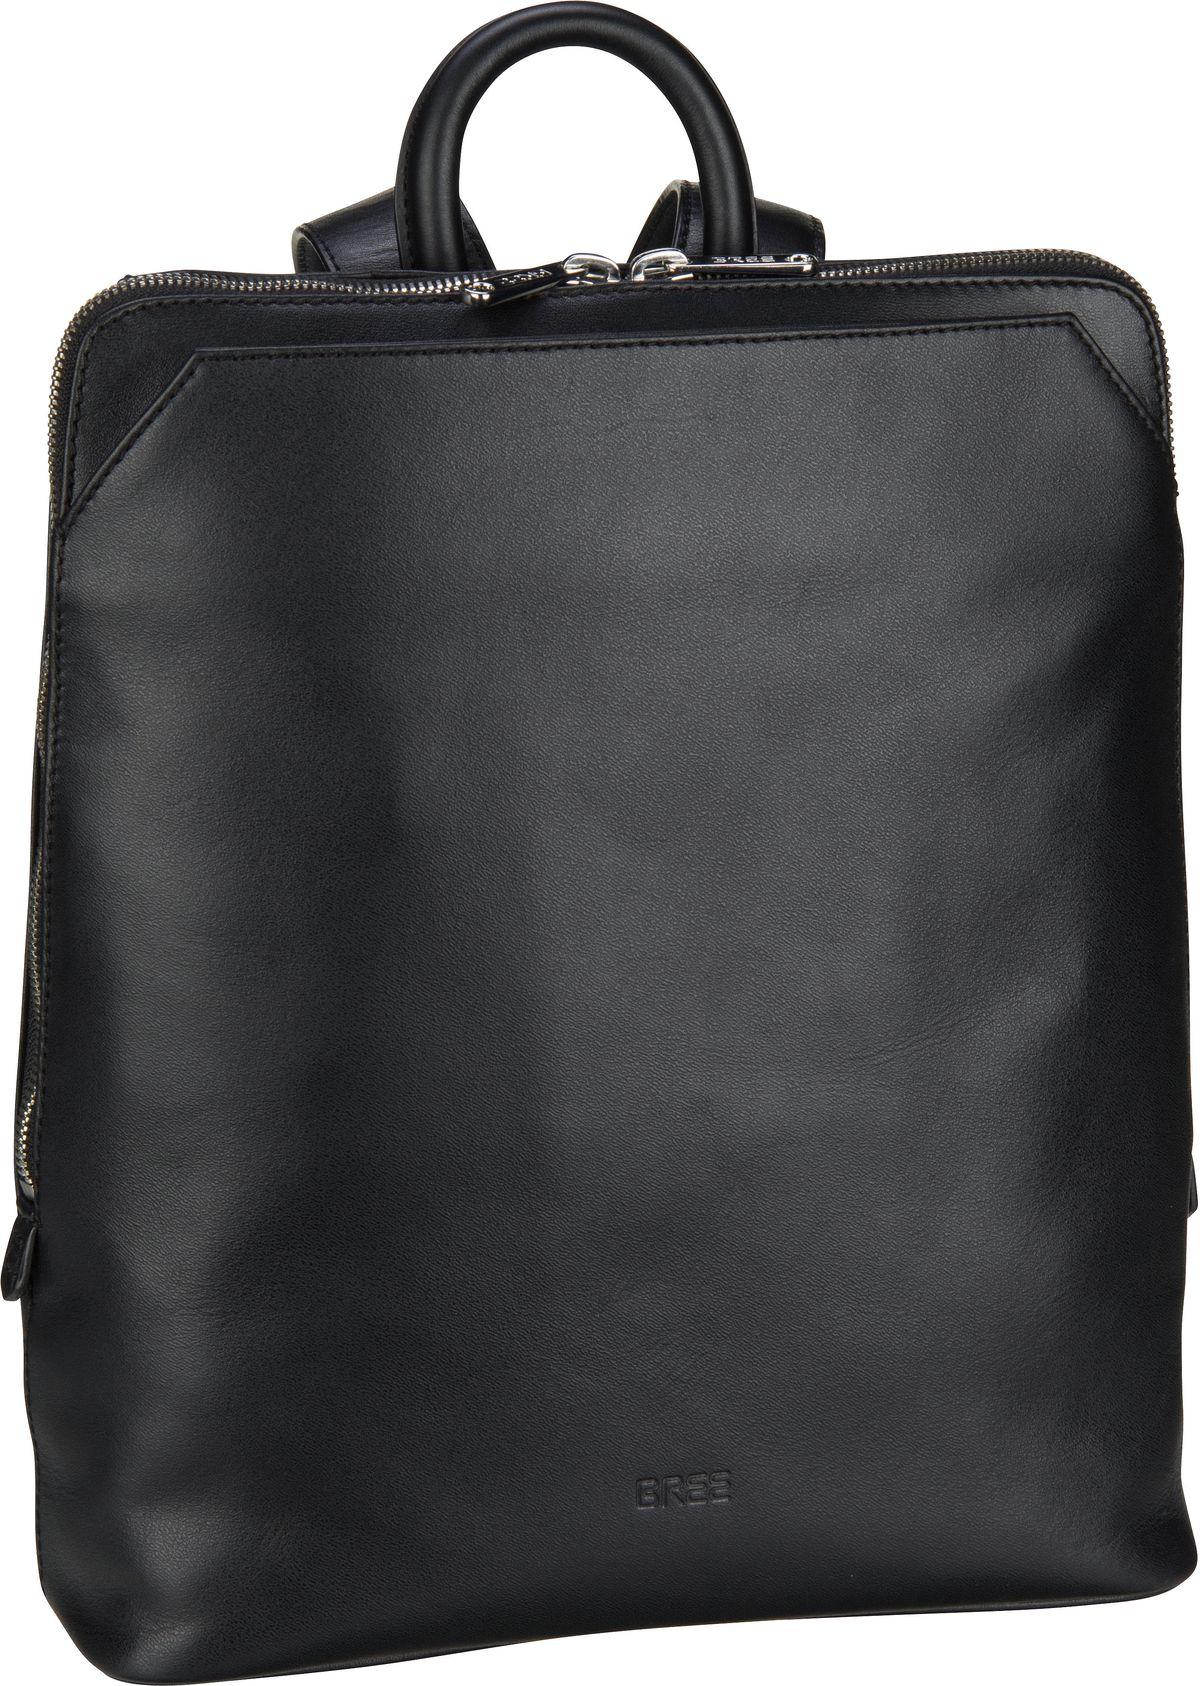 Rucksack / Daypack Chicago 8 Black (11 Liter)